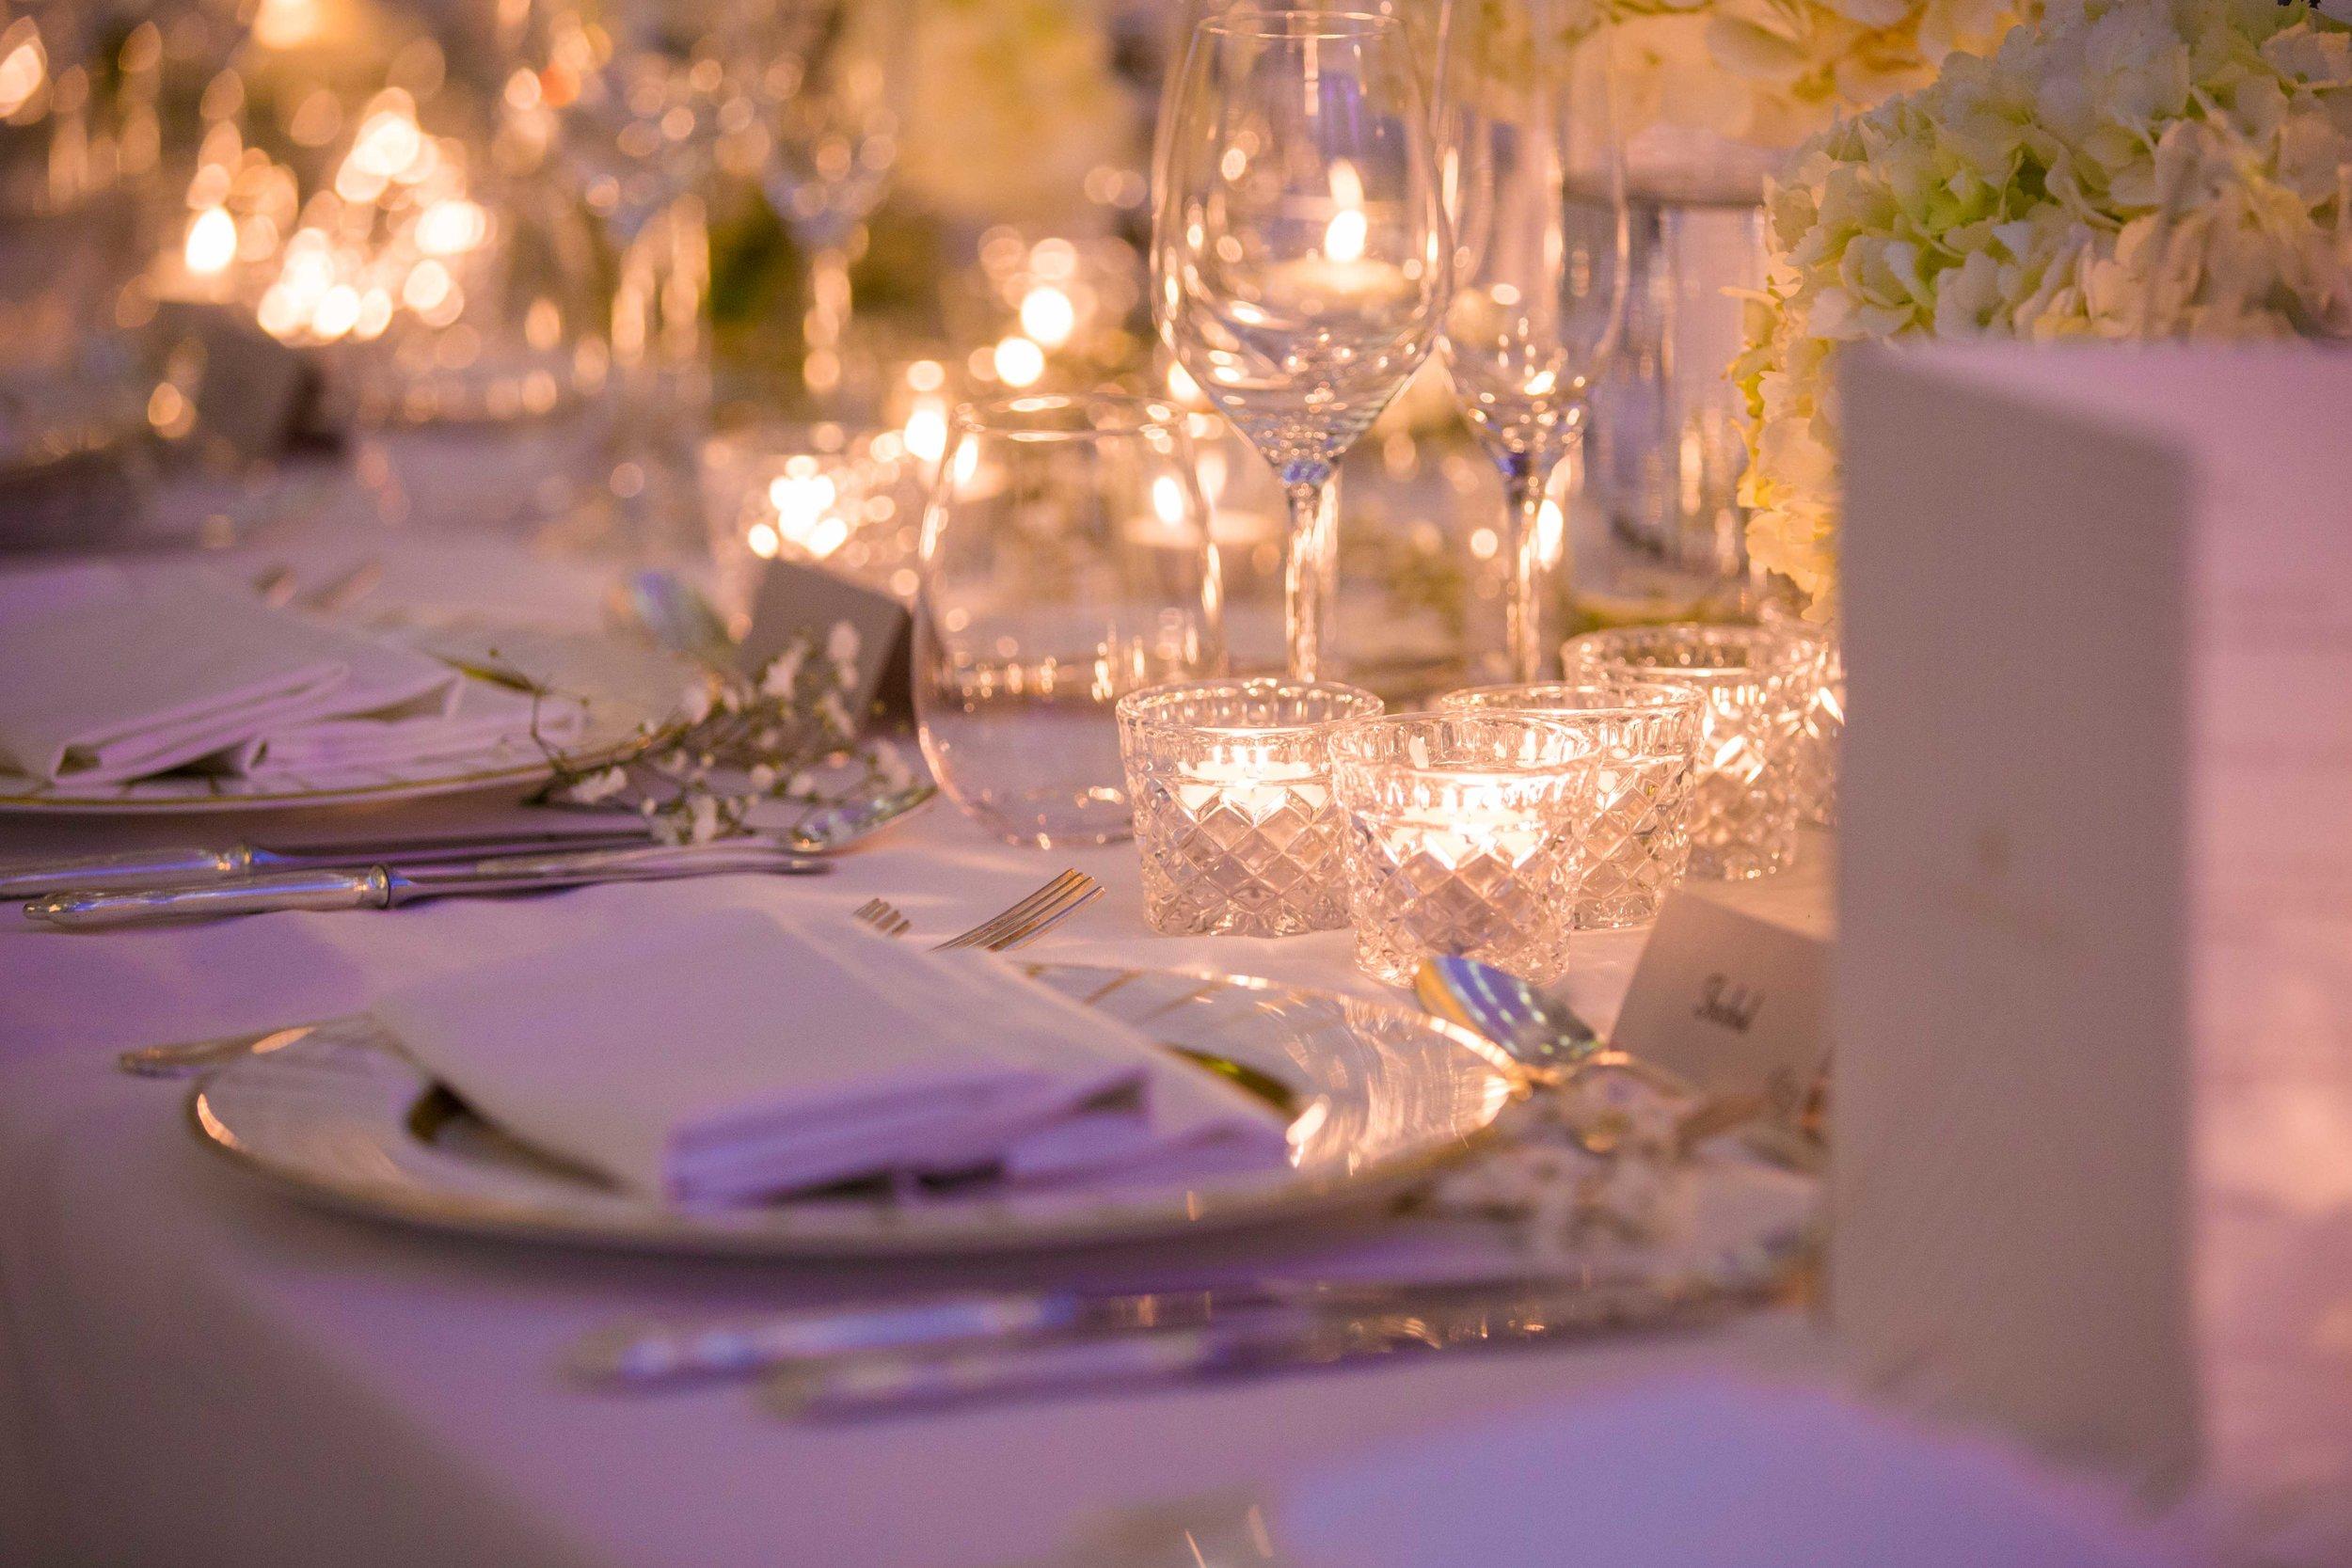 claridges-hotel-wedding-photographer-london-mayfair-natalia-smith-photography-91.jpg